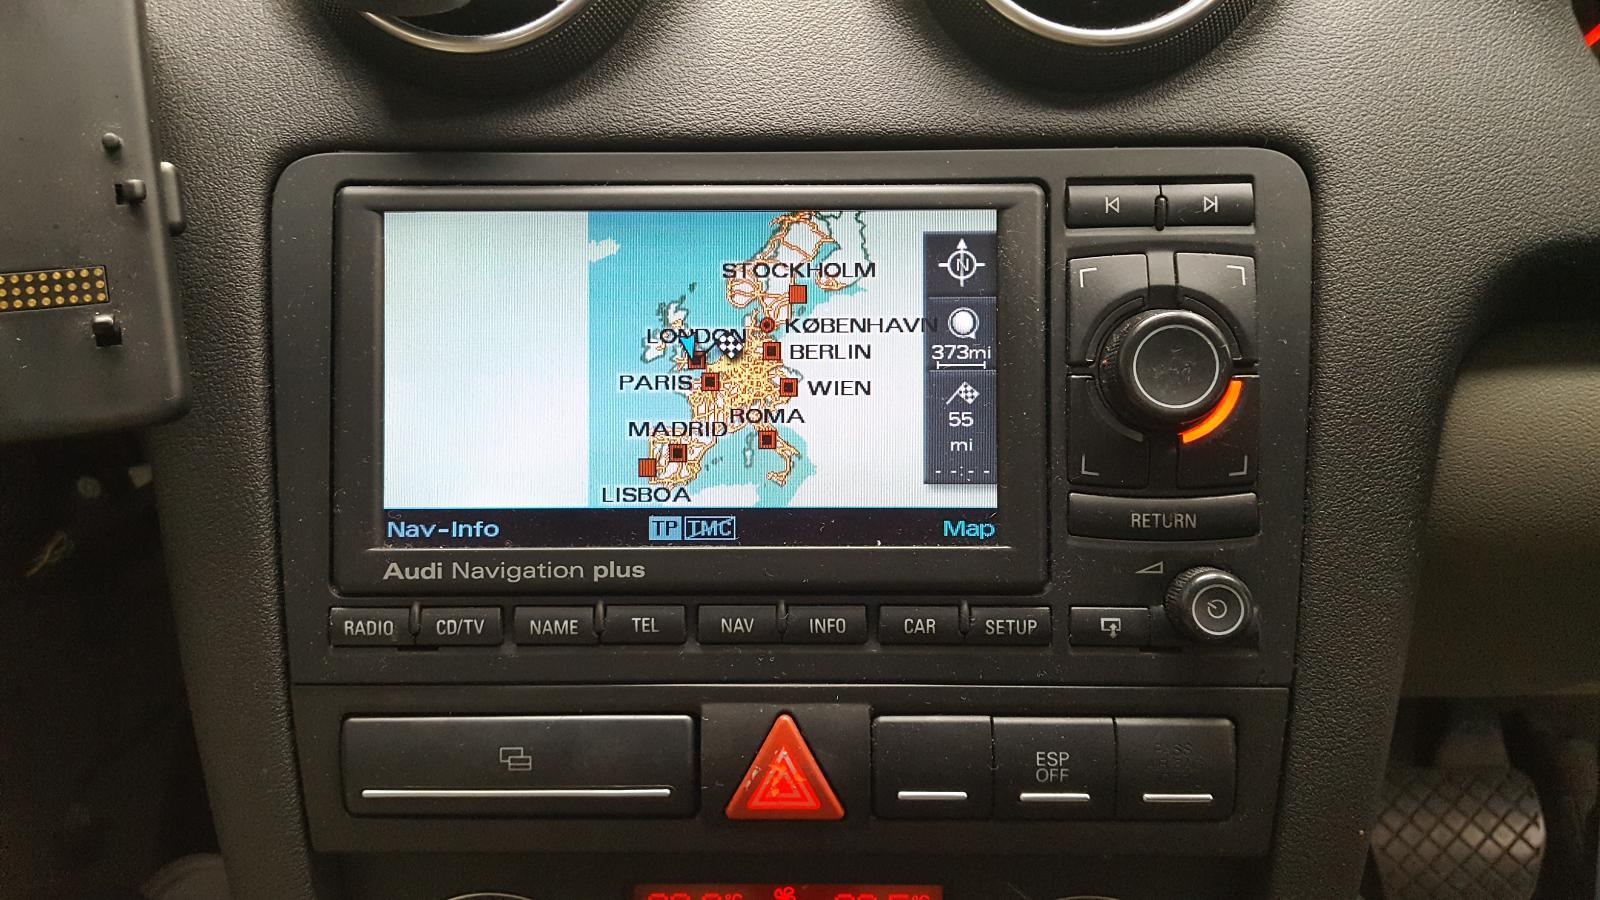 View Auto part A/V Equipment Audi A3 2005